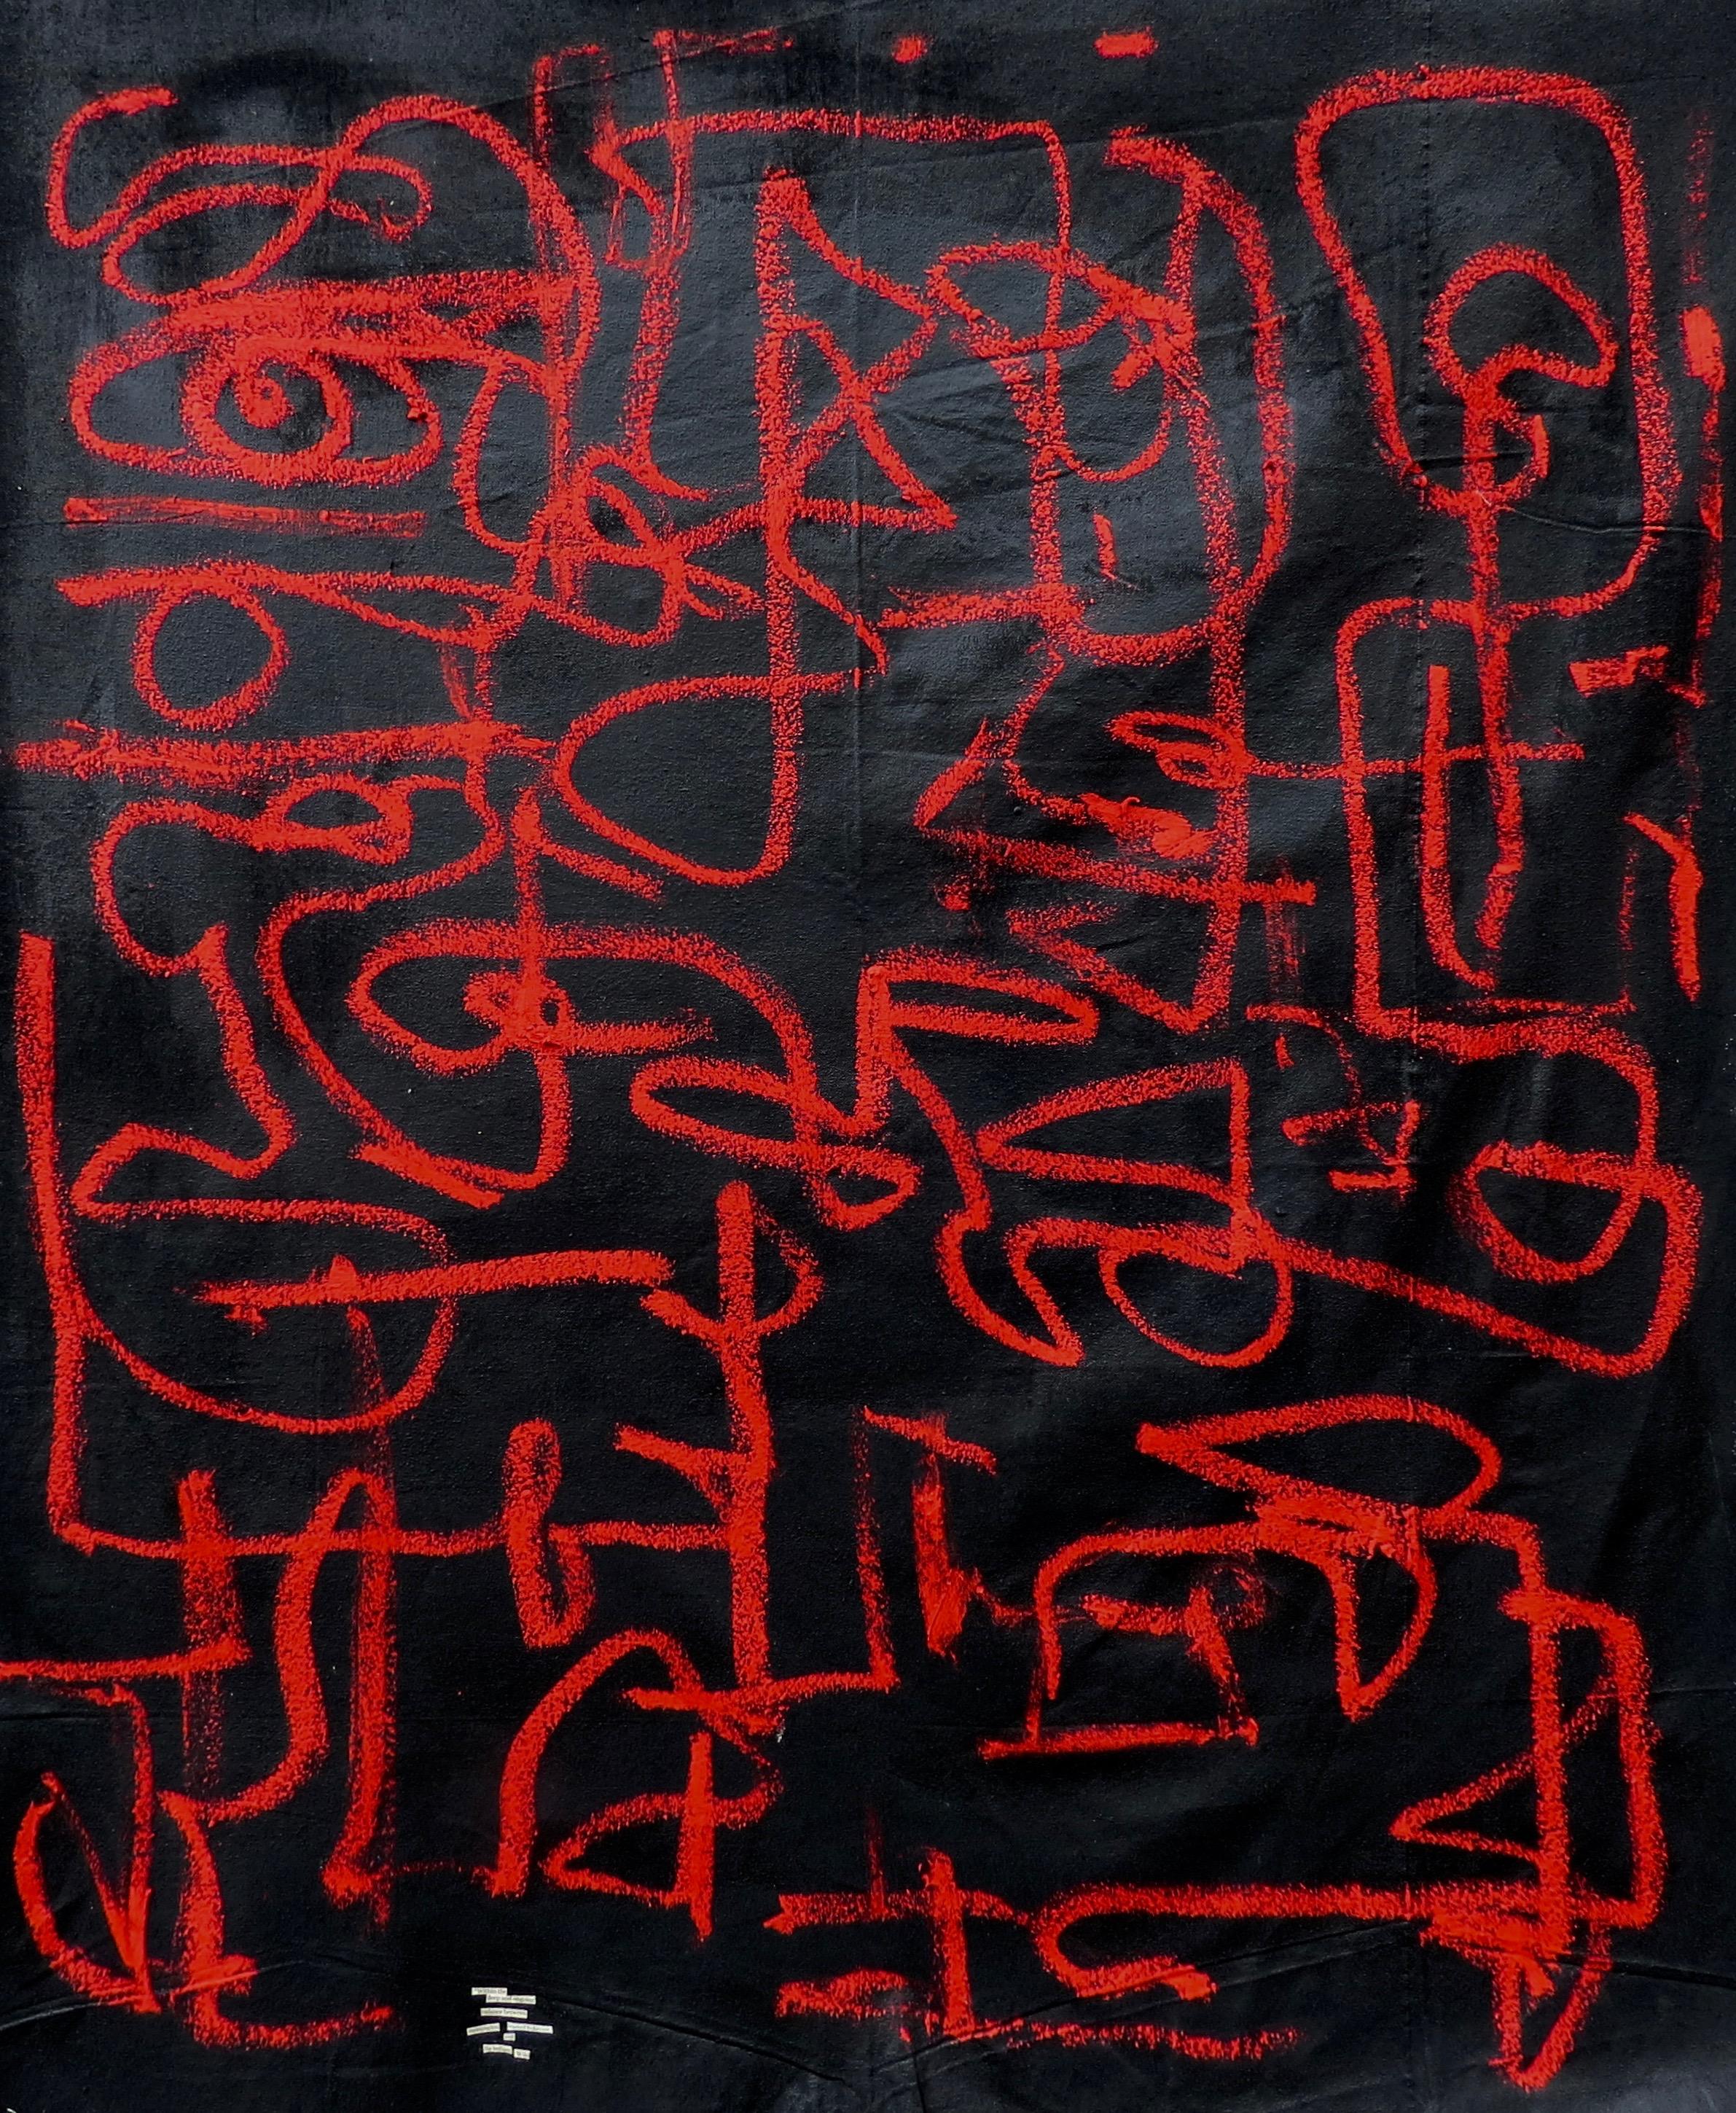 "the wild, 3'4"" x 4'5"", oil stick, acrylic on canvas - 2018"